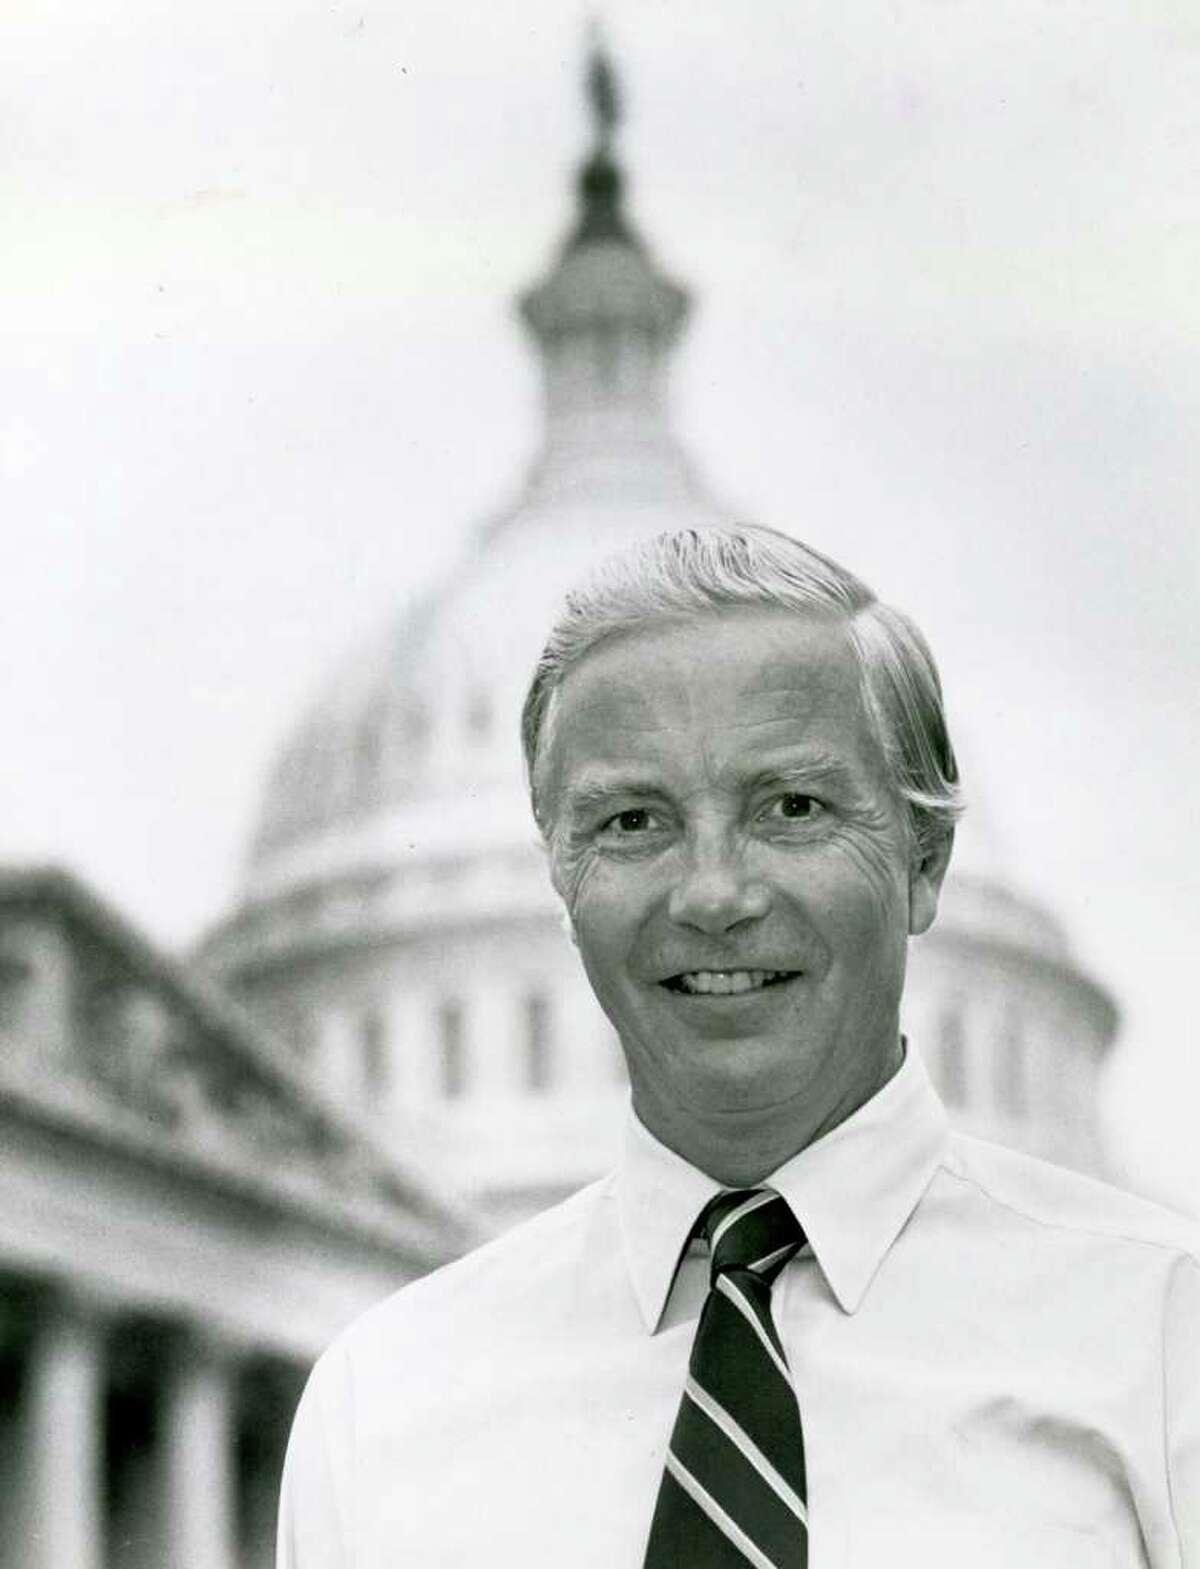 Congressman William Ratchford photographed in Washington in April 1979. Photo taken by News-Times photographer Stephen Szurlej.